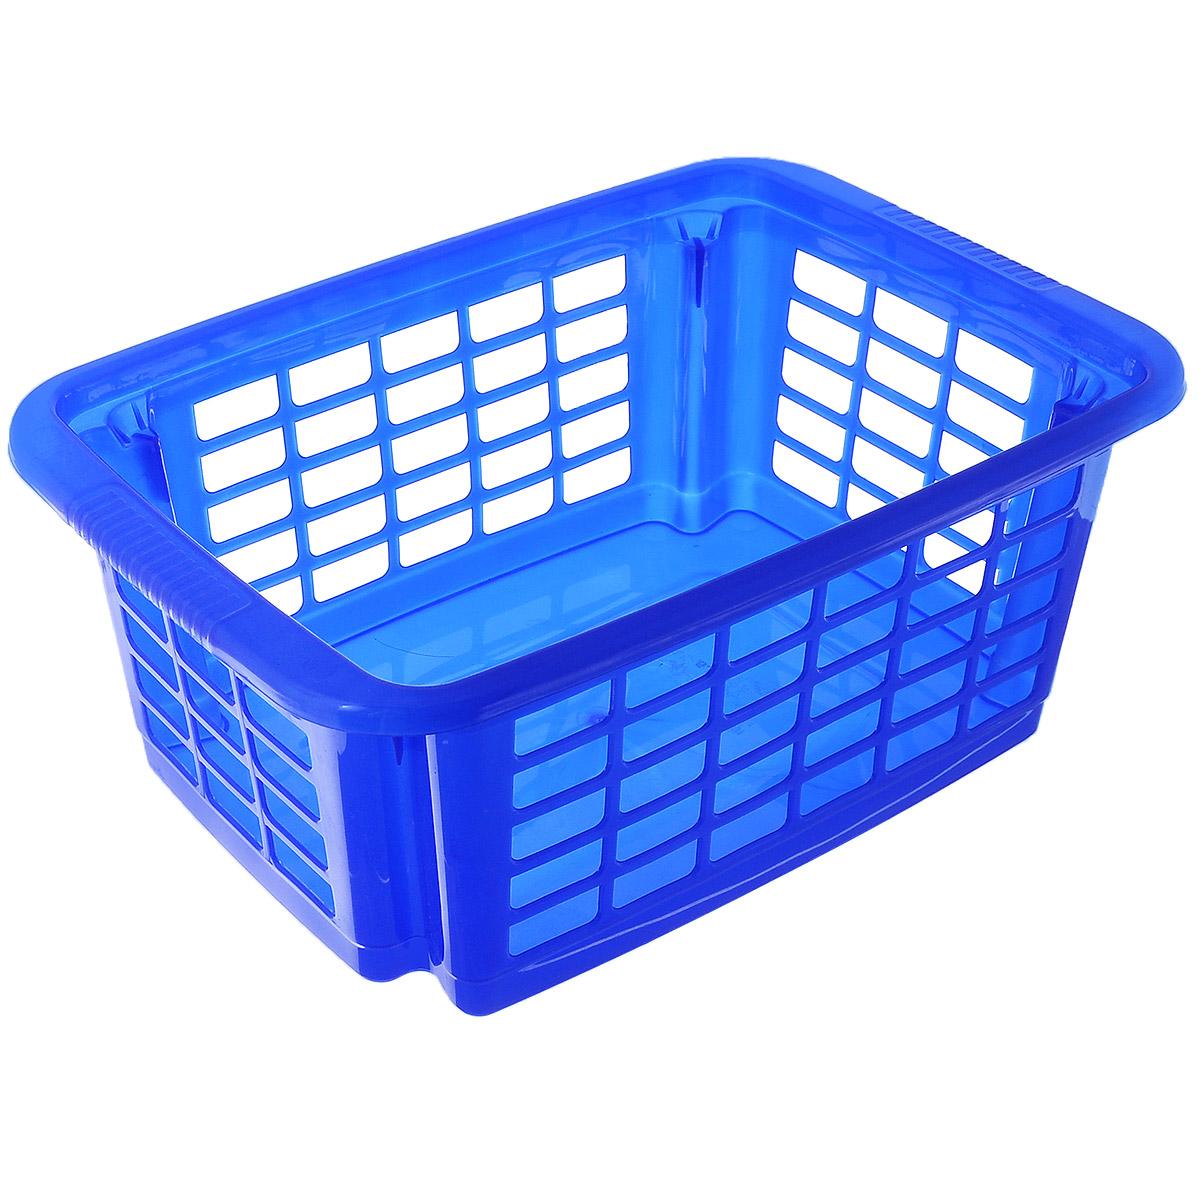 ������� ��� �������� Dunya Plastik ������, �������������, ����: �����, 30 �� � 18,5 �� � 12,5 �� - Dunya Plastik05506������������ ������� Dunya Plastik ������, ������������� �� ��������, ������������� ��� �������� ������� � ������, �� �����, ���� ��� ������. ��������� ������� ������ ����, �������� ����������� �� ������. ��� ������ ������� �� �������� ����, ������� �������, � ���������� ����������� �� �������. ������� ����� ����������� ������ ����� � ������, ����������� ������������� ������� ���� �� �����.